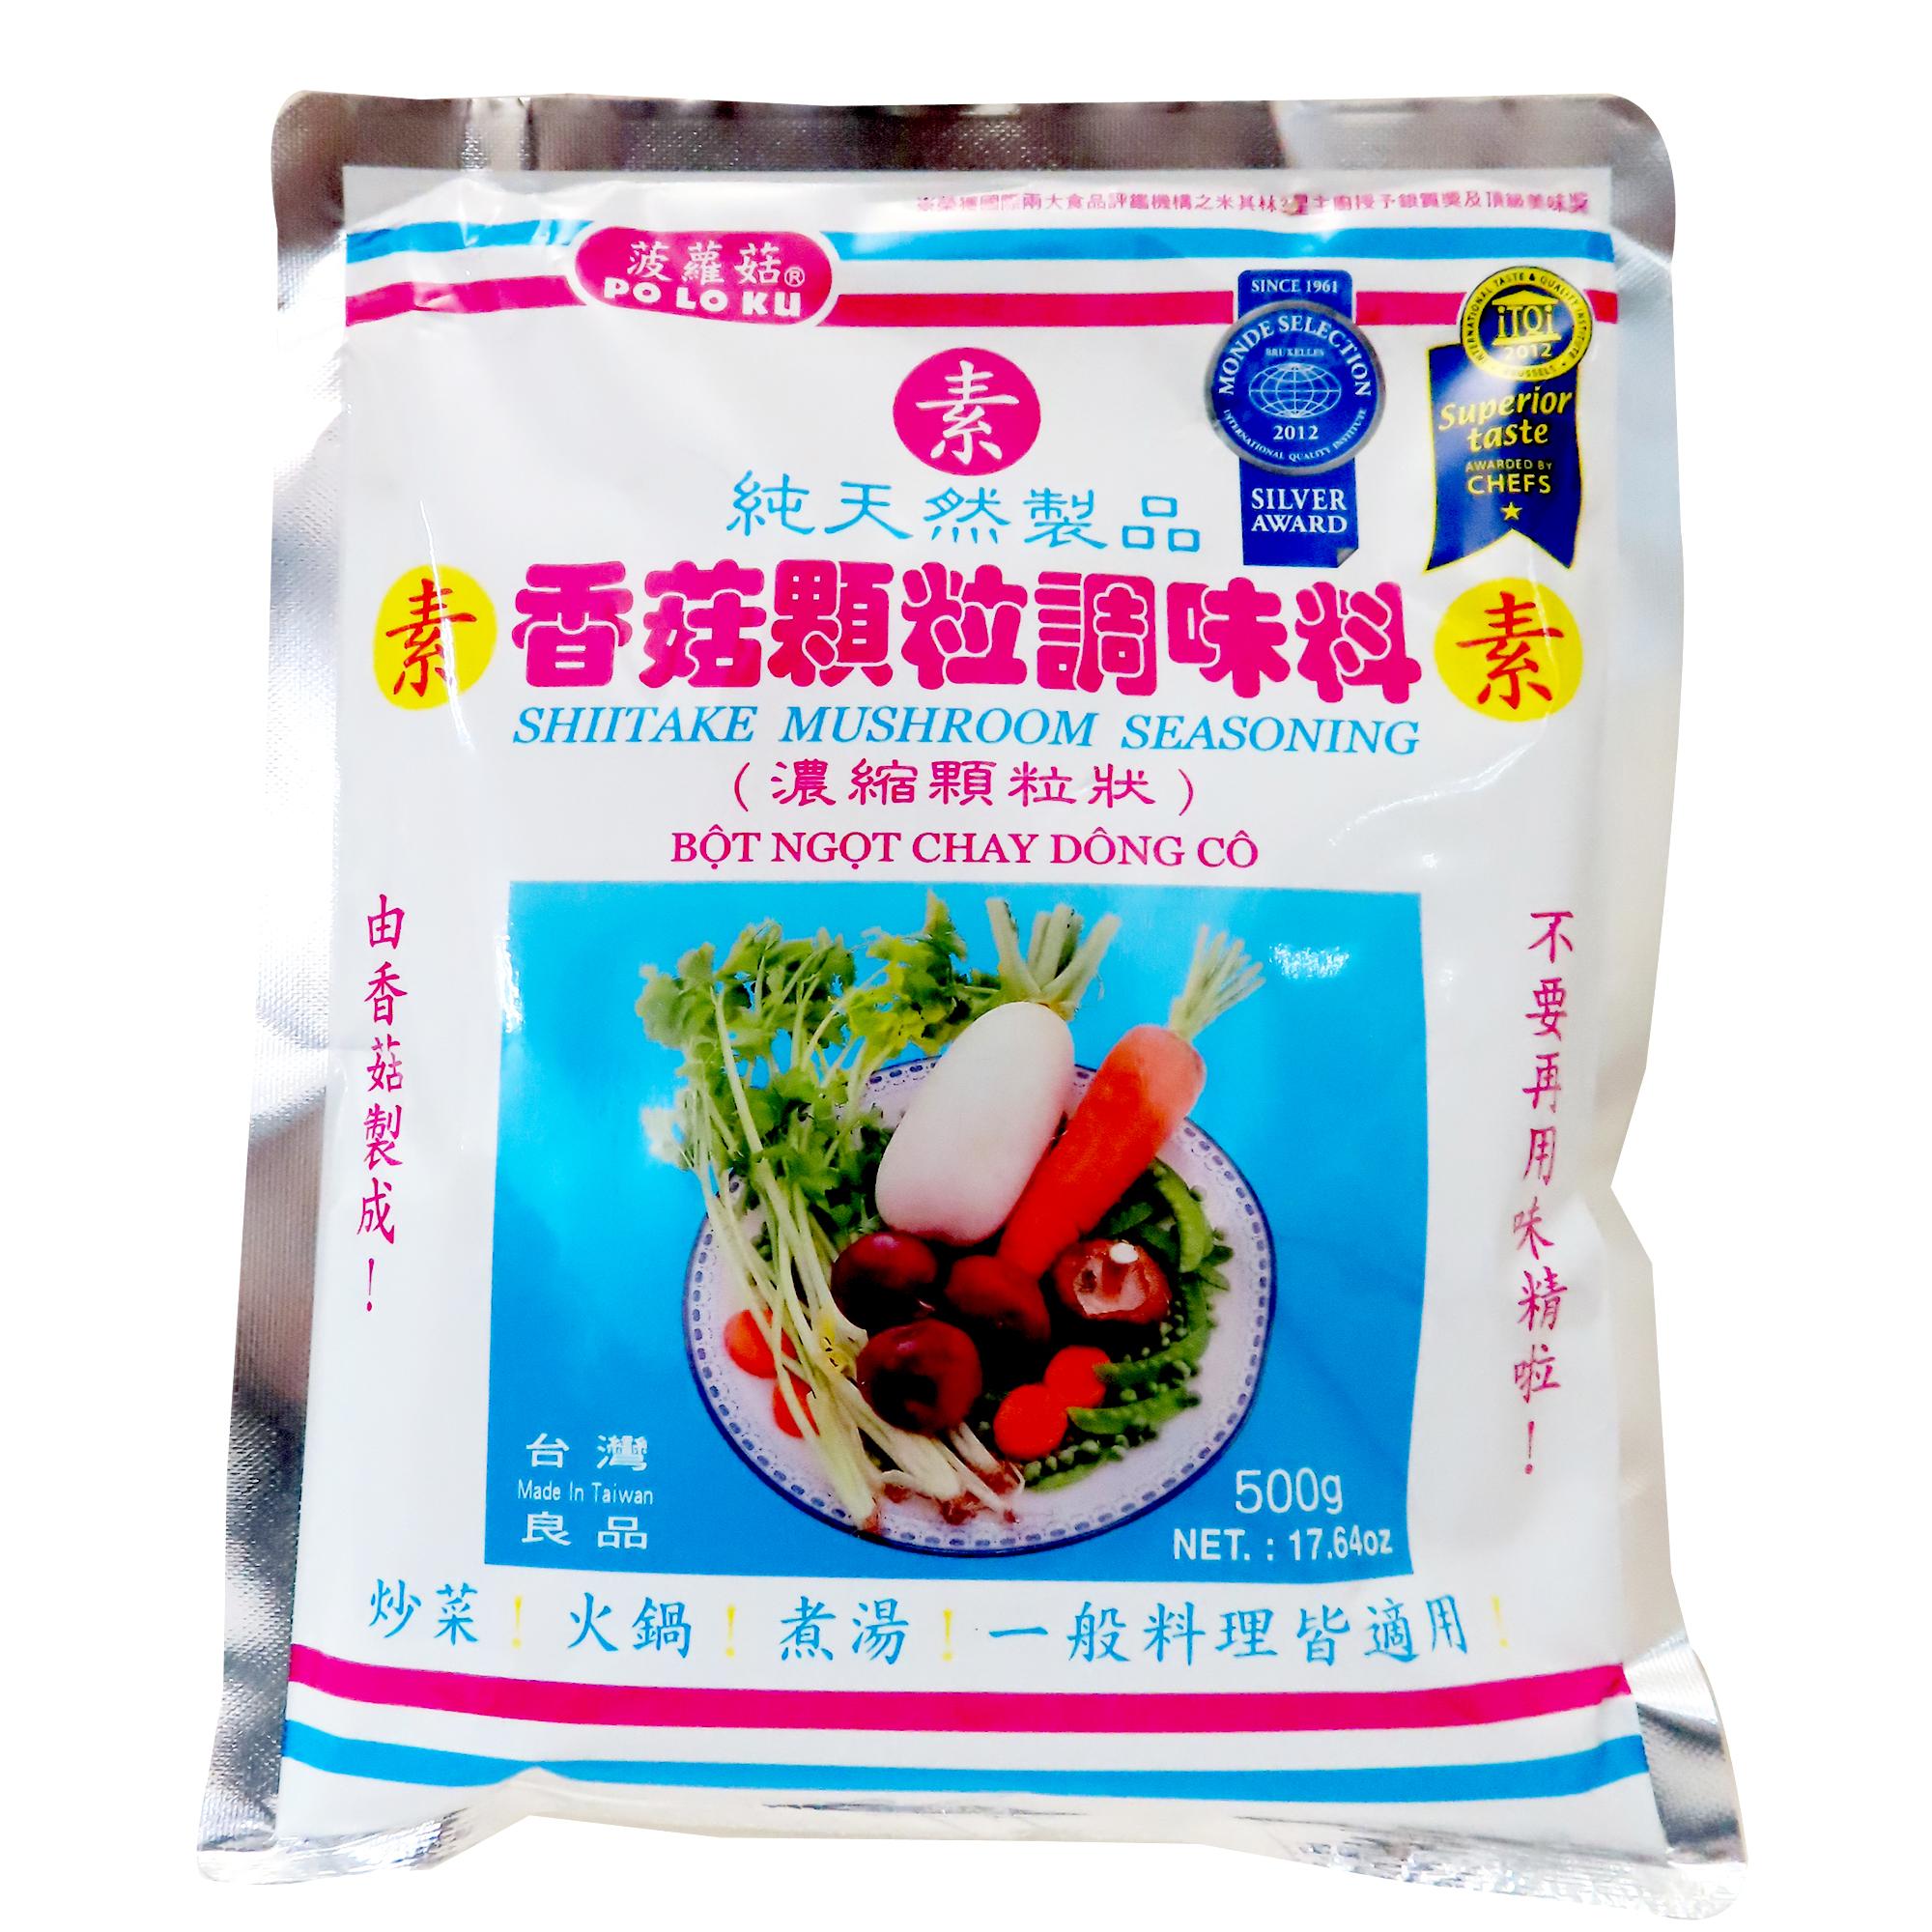 Image Poloku Mushroom Seasoning 菠萝菇-香菇颗粒调味料 500 grams